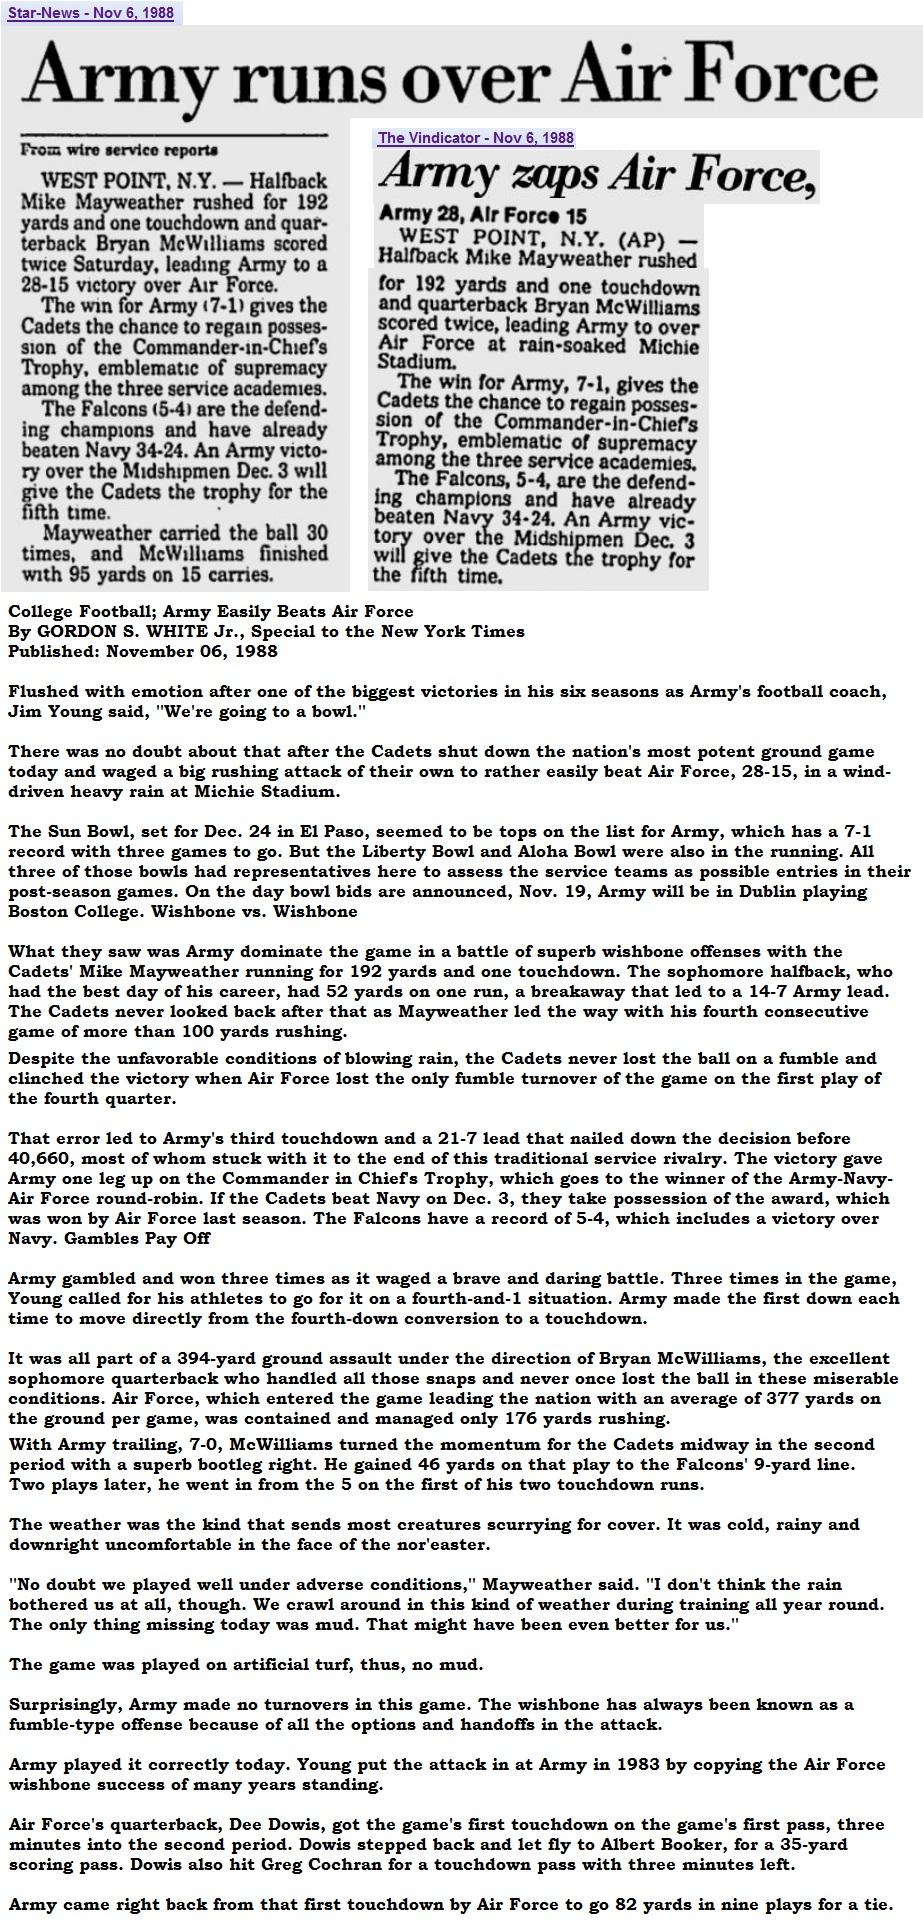 ArmyFB_1988_vsAF_various_Nov61988